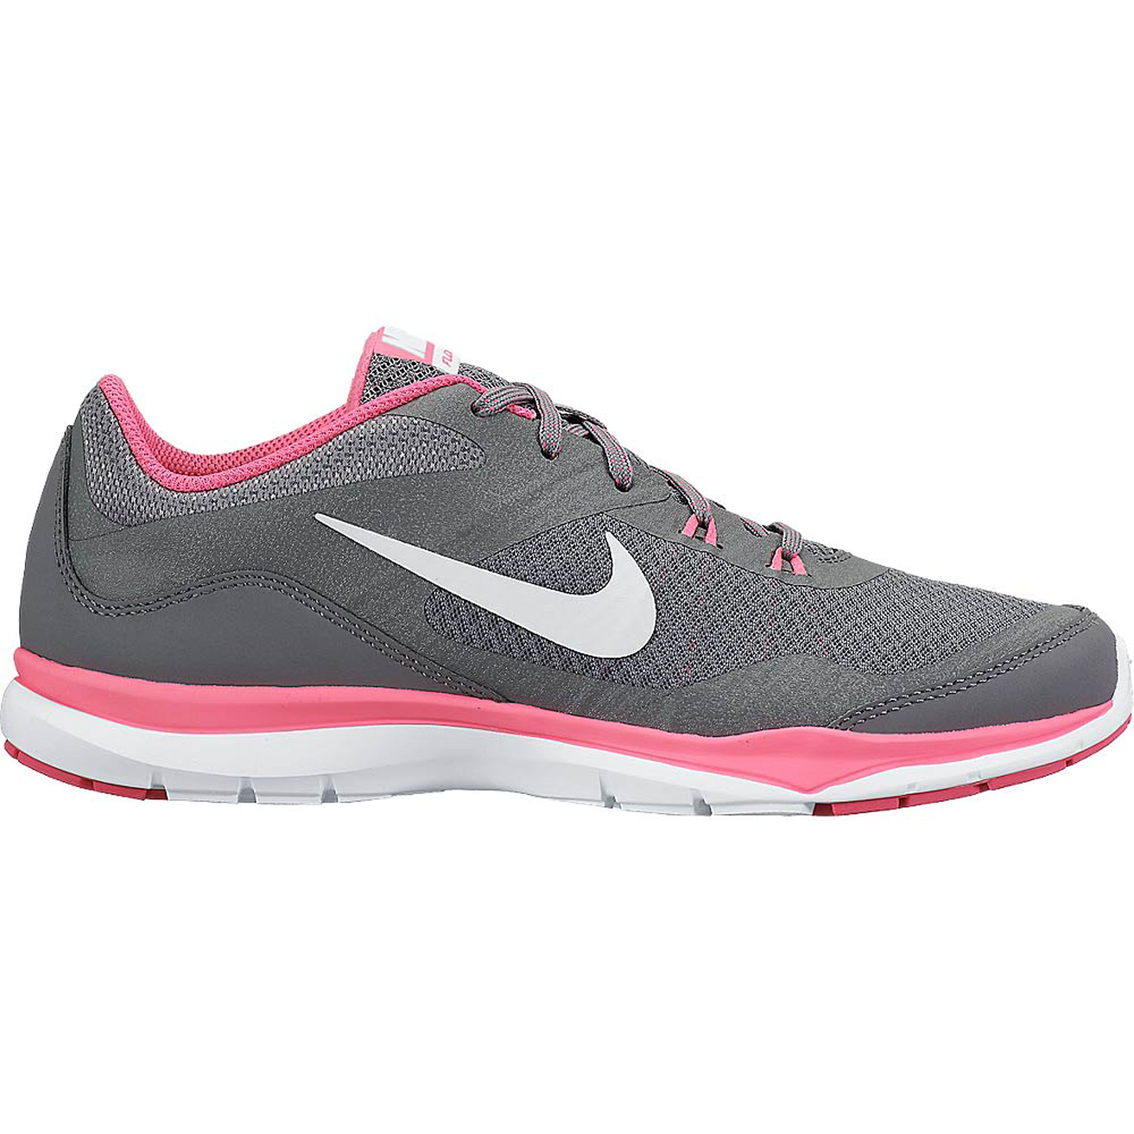 Nike Women s Flex Trainer 5 Cross Training Shoes  372bff947